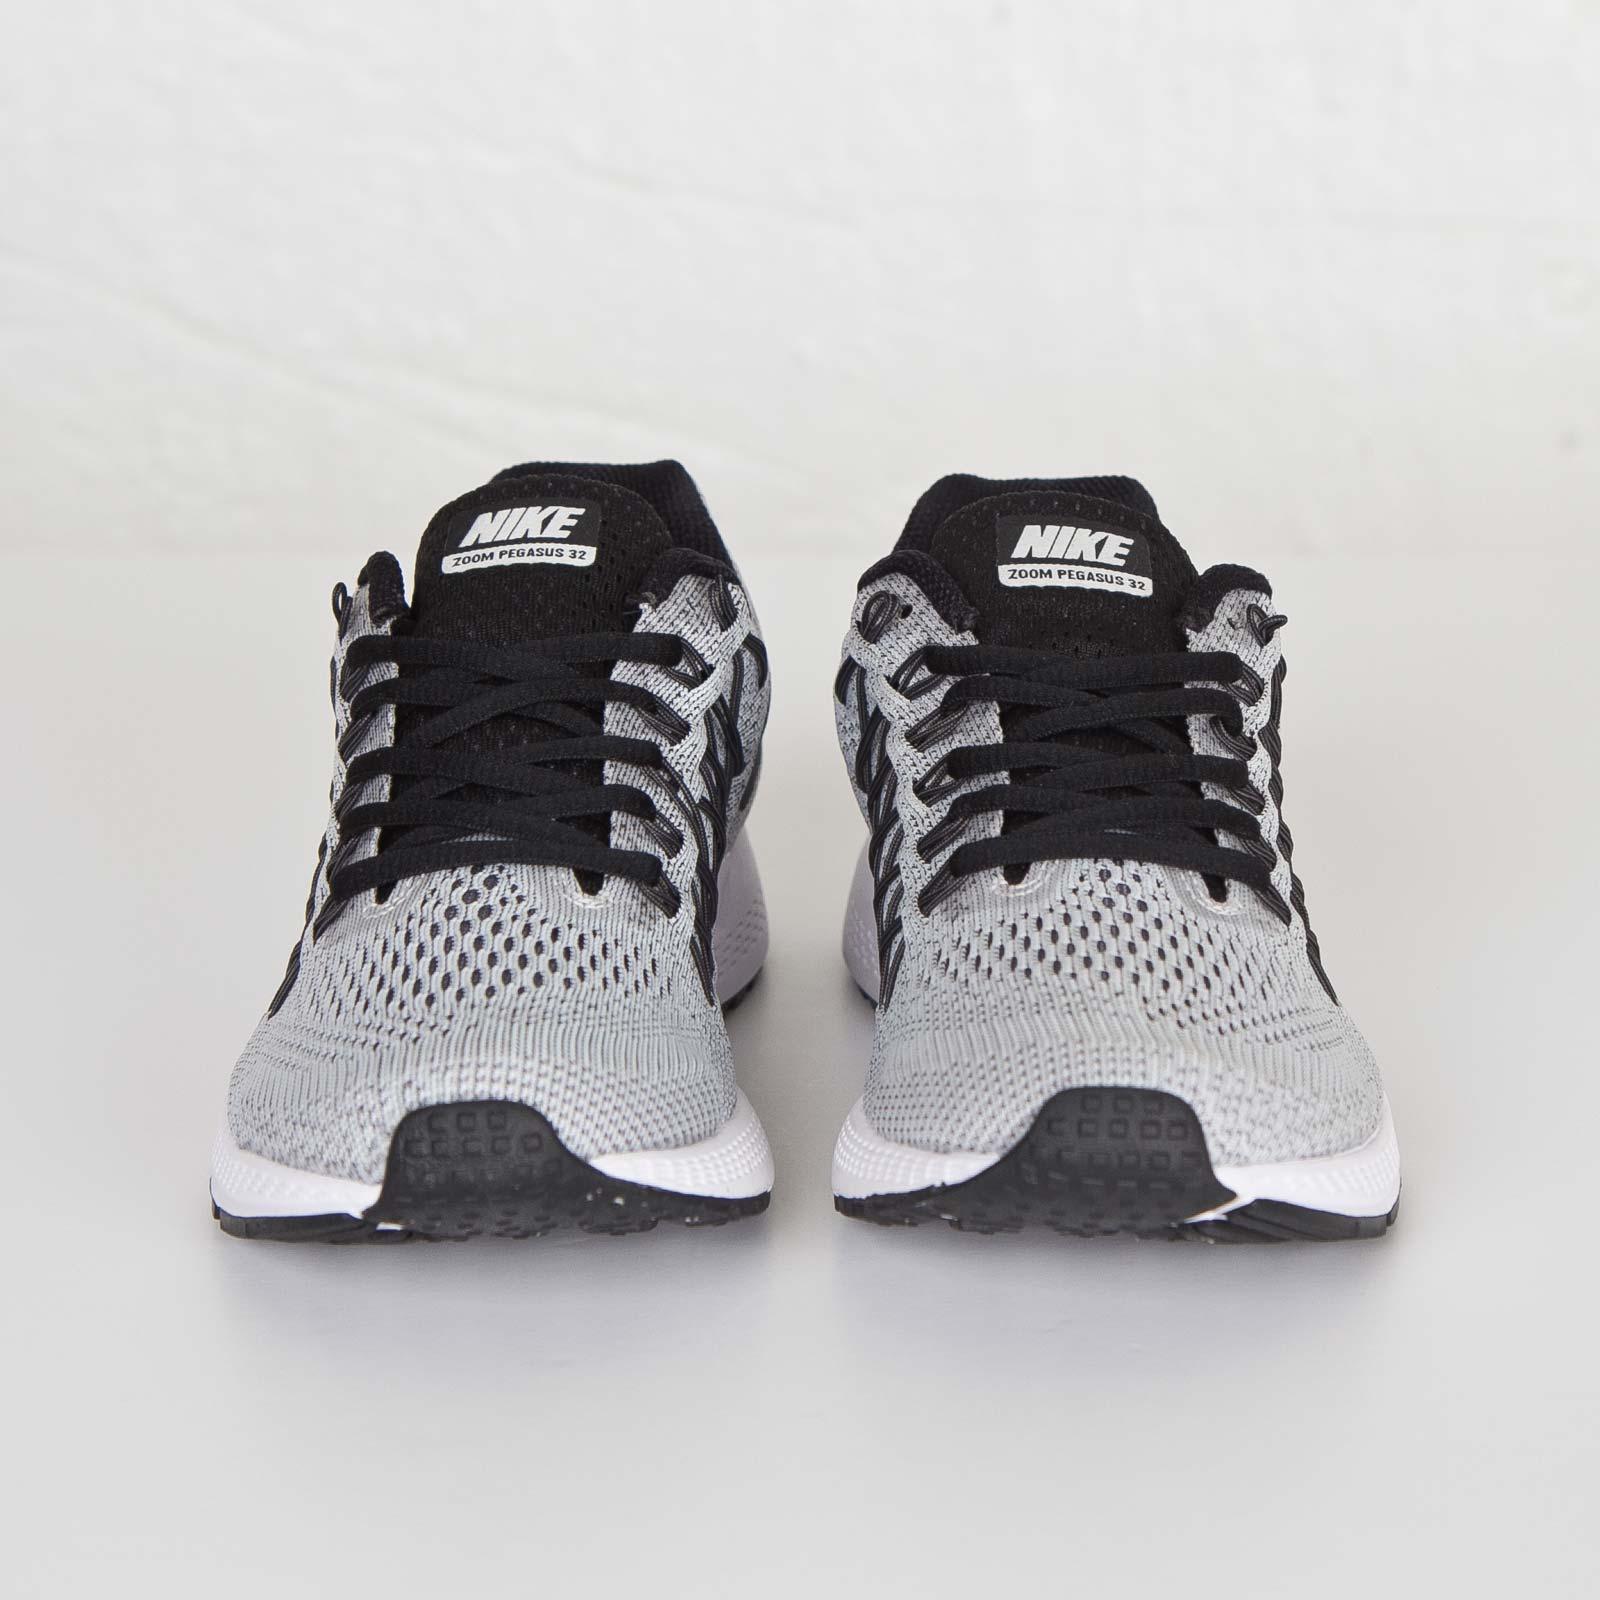 meet f8614 43206 ... Nike Wmns Air Zoom Pegasus 32 ...